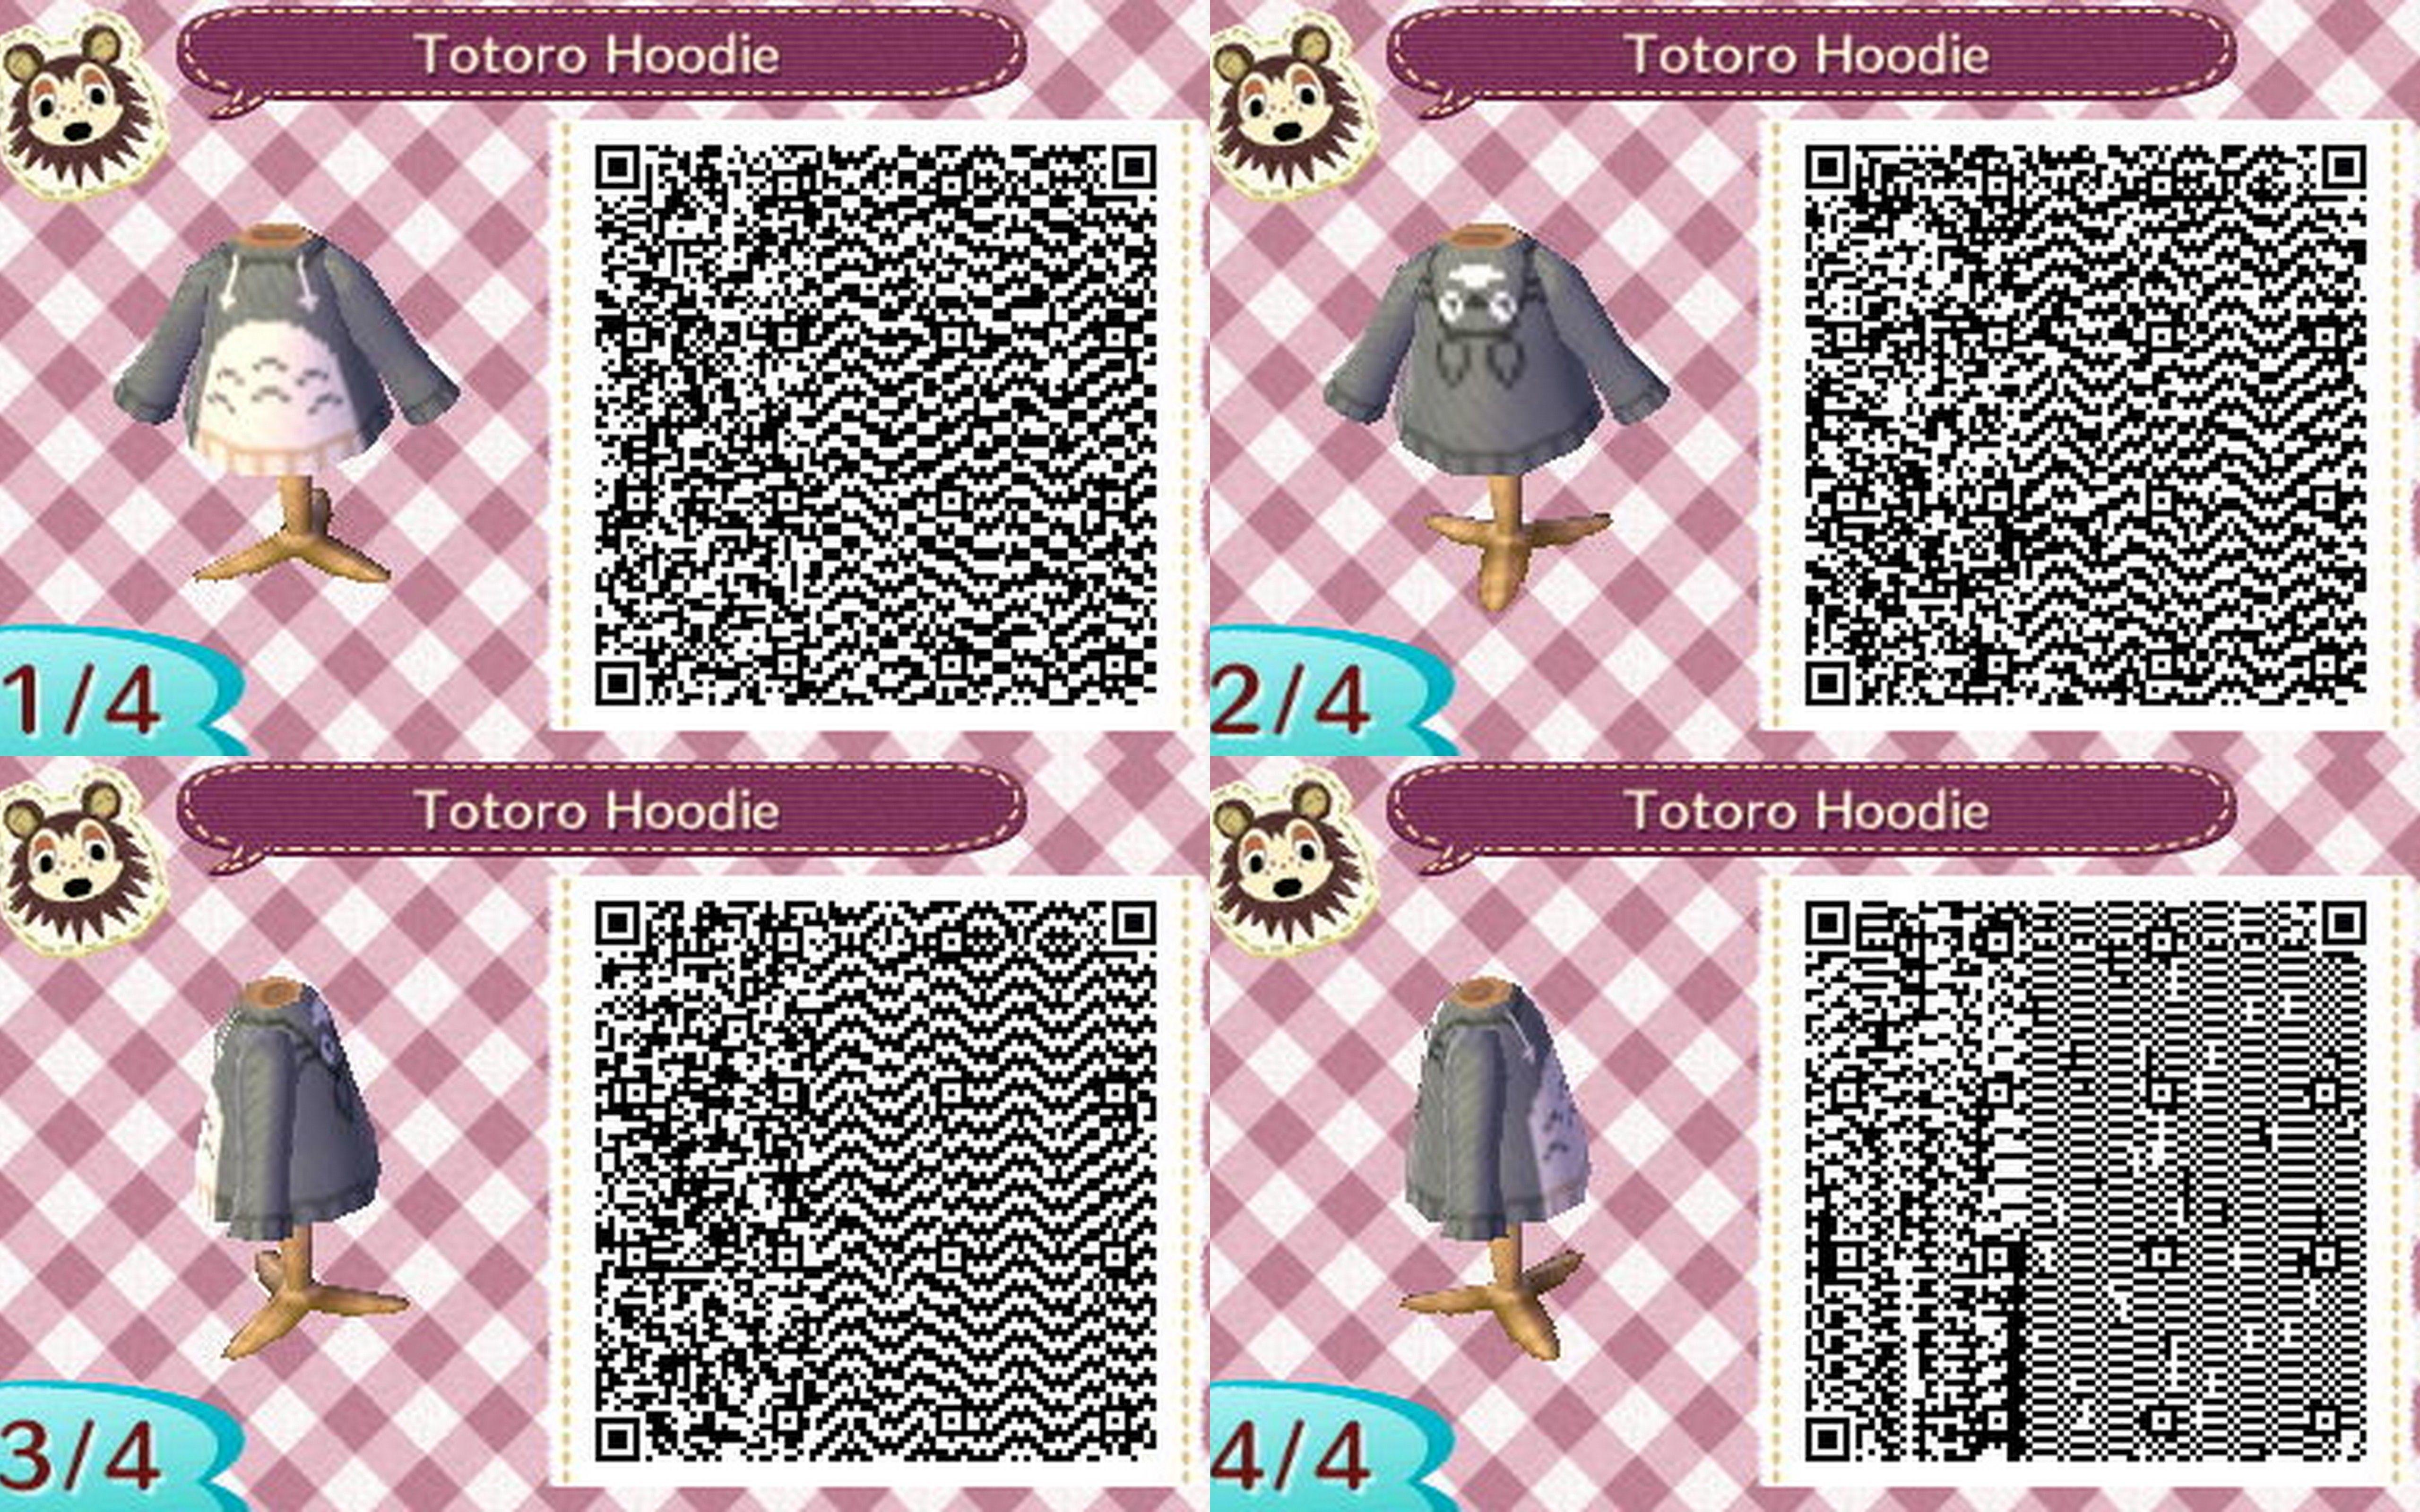 Animal crossing new leaf hoodie Clothes Animal Crossing Totoro Hoodie Qr Pinterest Animal Crossing Totoro Hoodie Qr Happy Home Qr Codes Pinterest